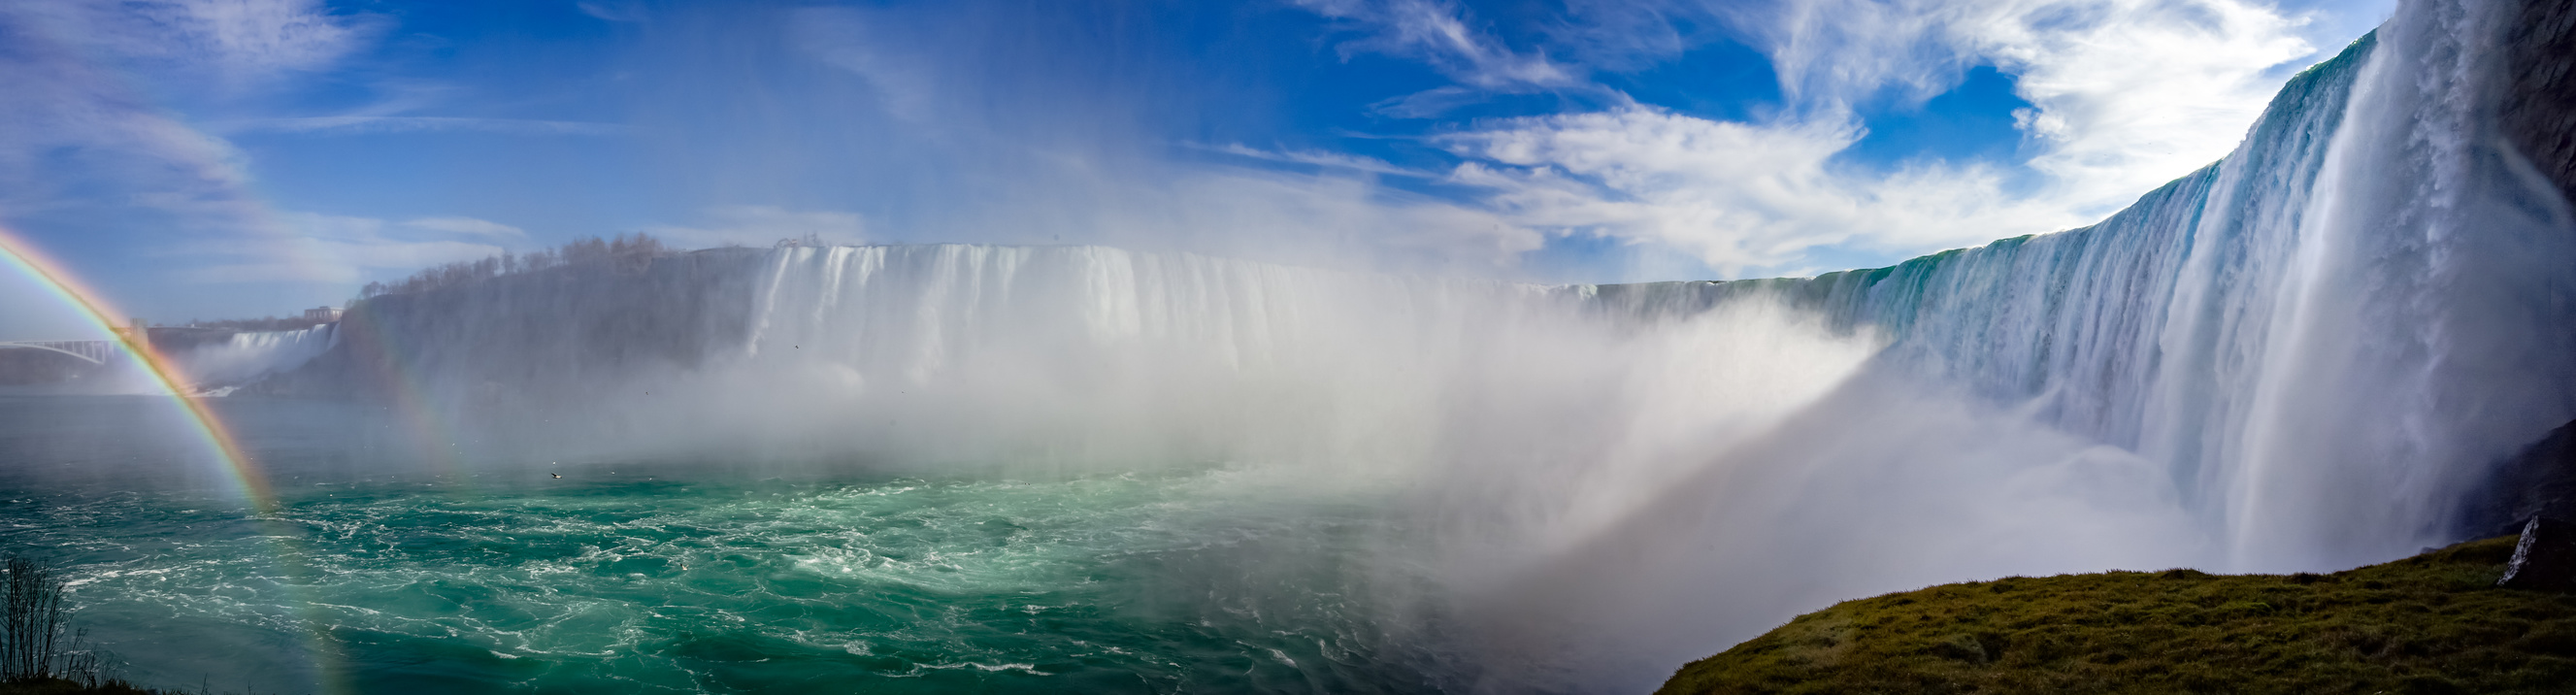 Panoramafoto der Niagarafälle